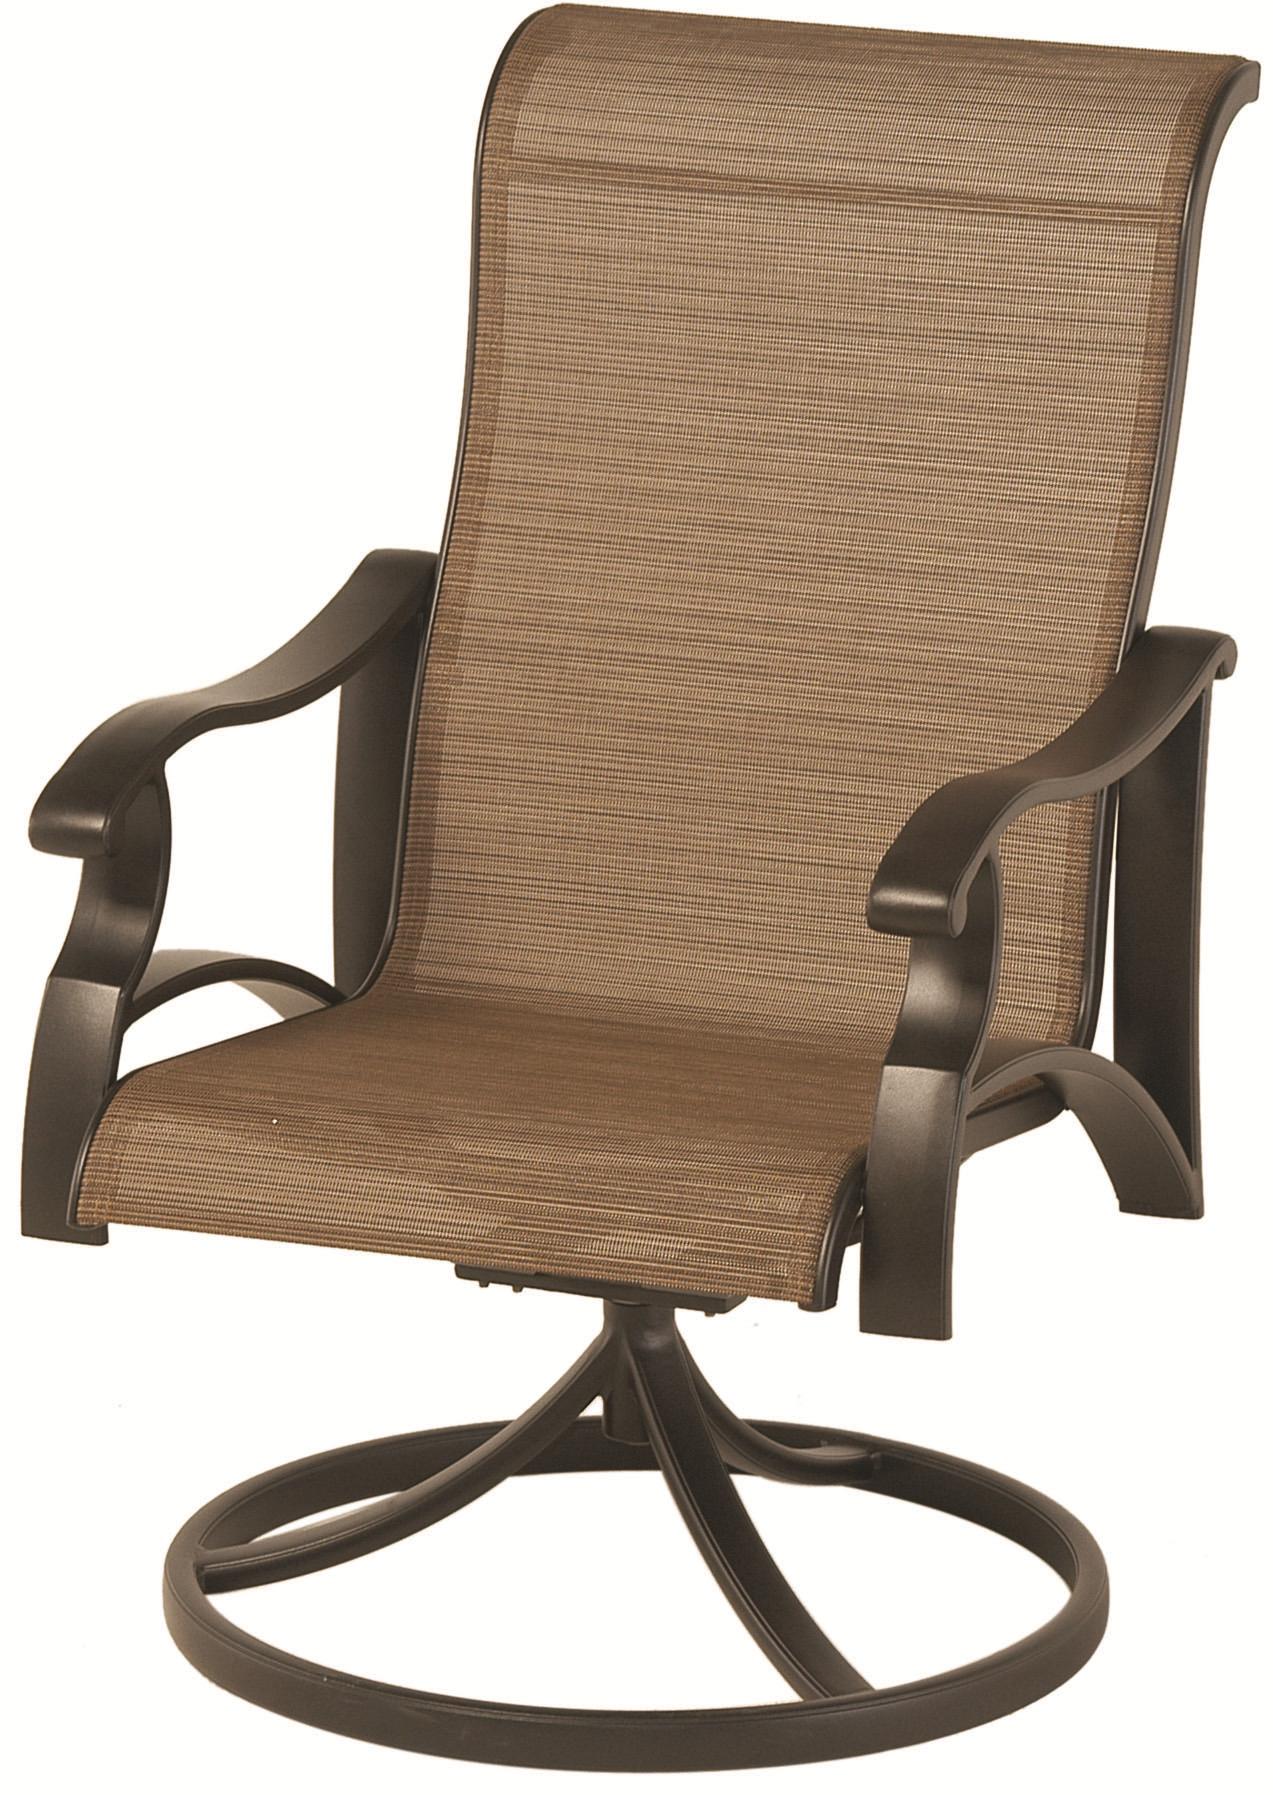 Somerset Swivel Rocker Sling Dining Chair